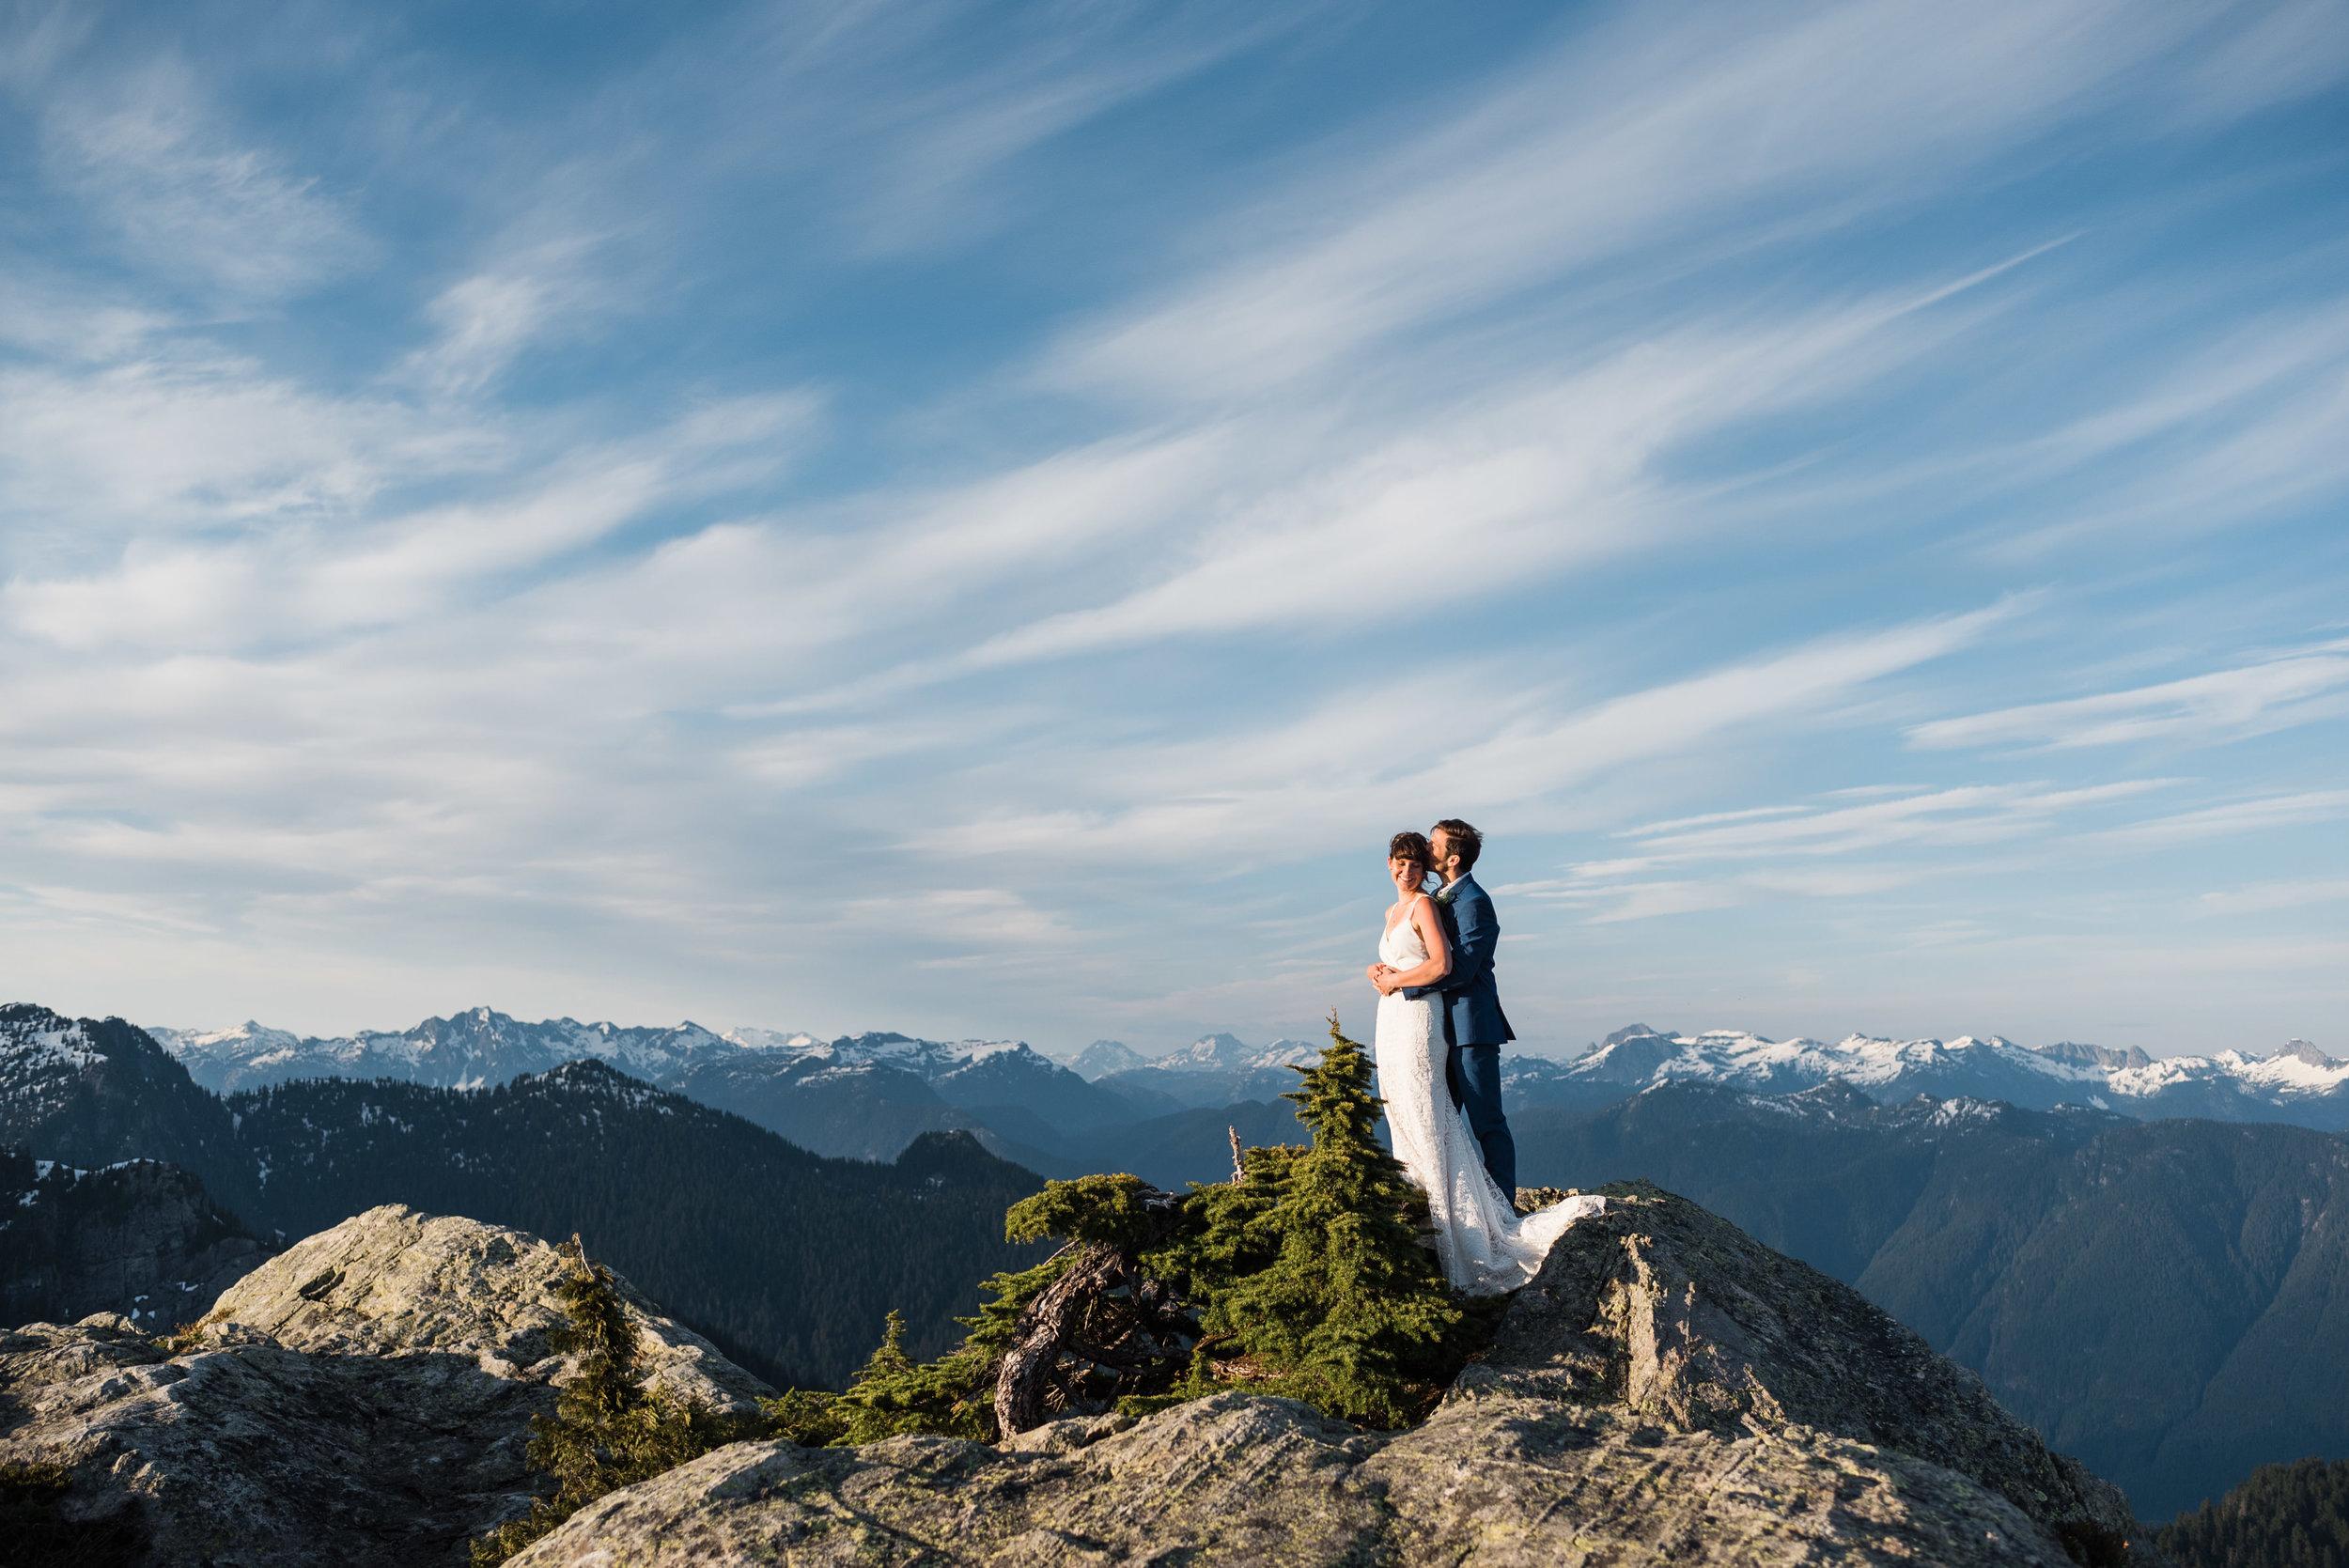 Mt-Seymour-styled-shoot-0015-jelger-tanja-photographers.jpg